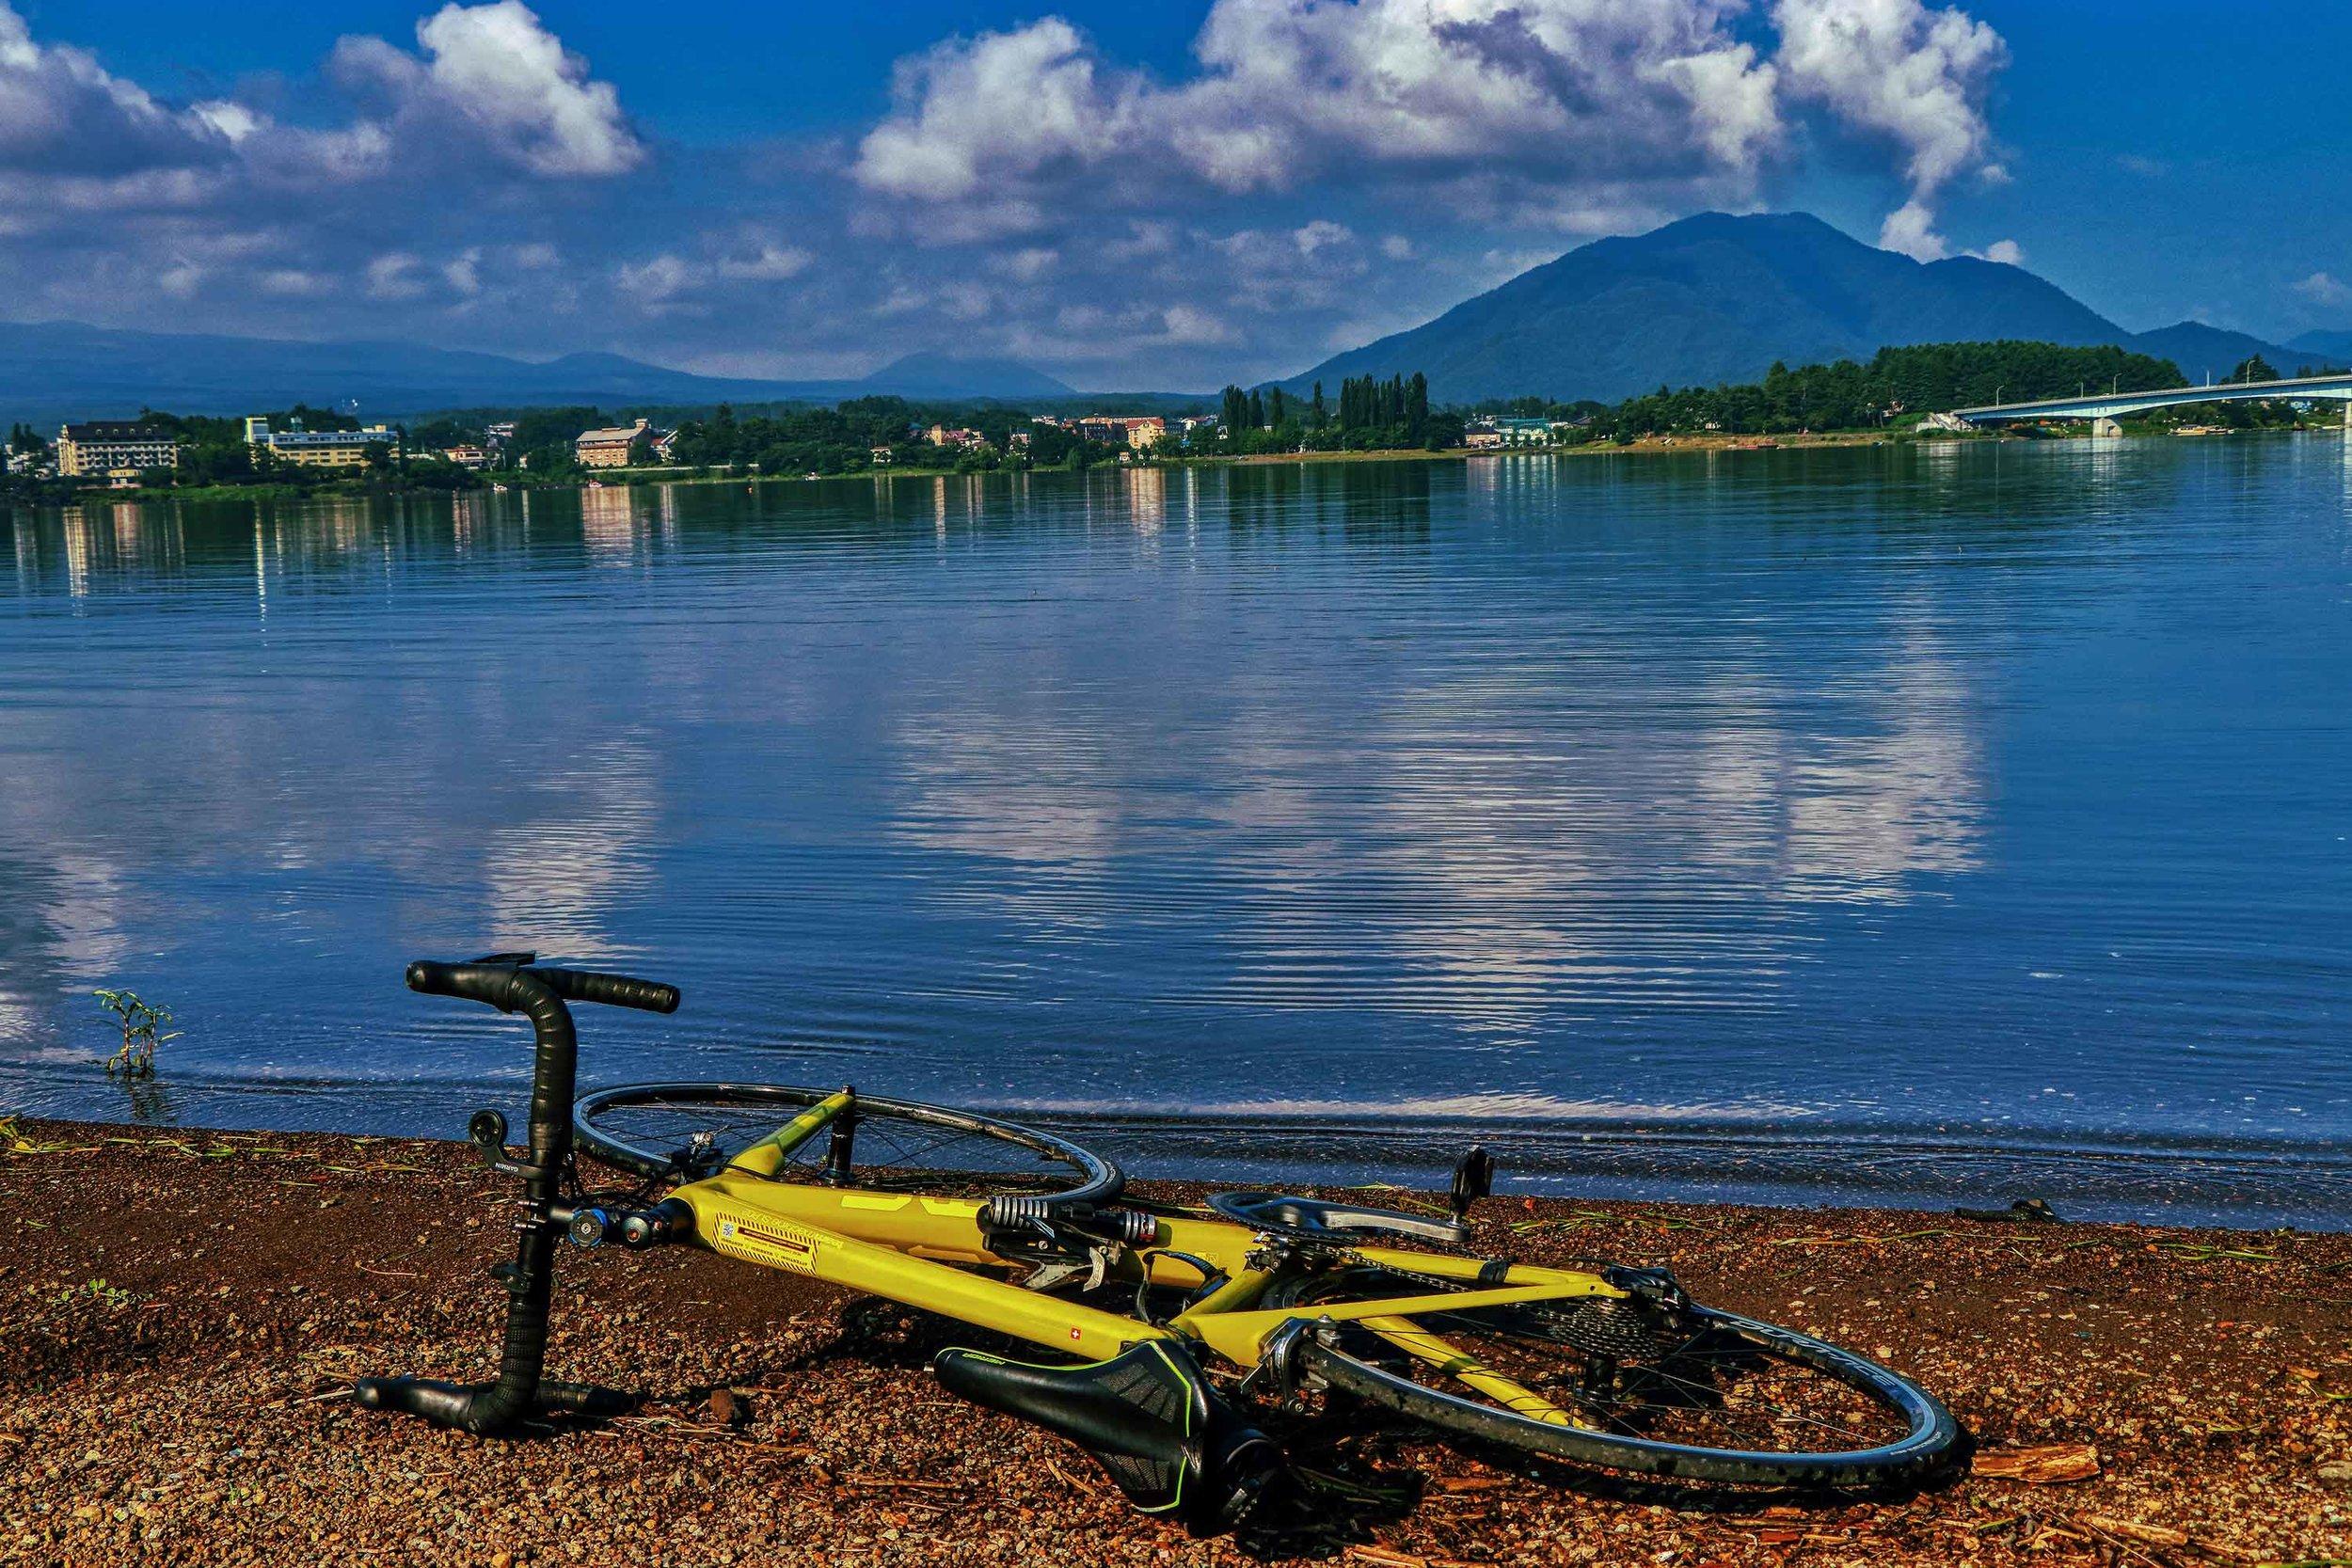 Fuji Five Lakes, Kawaguchi Ko